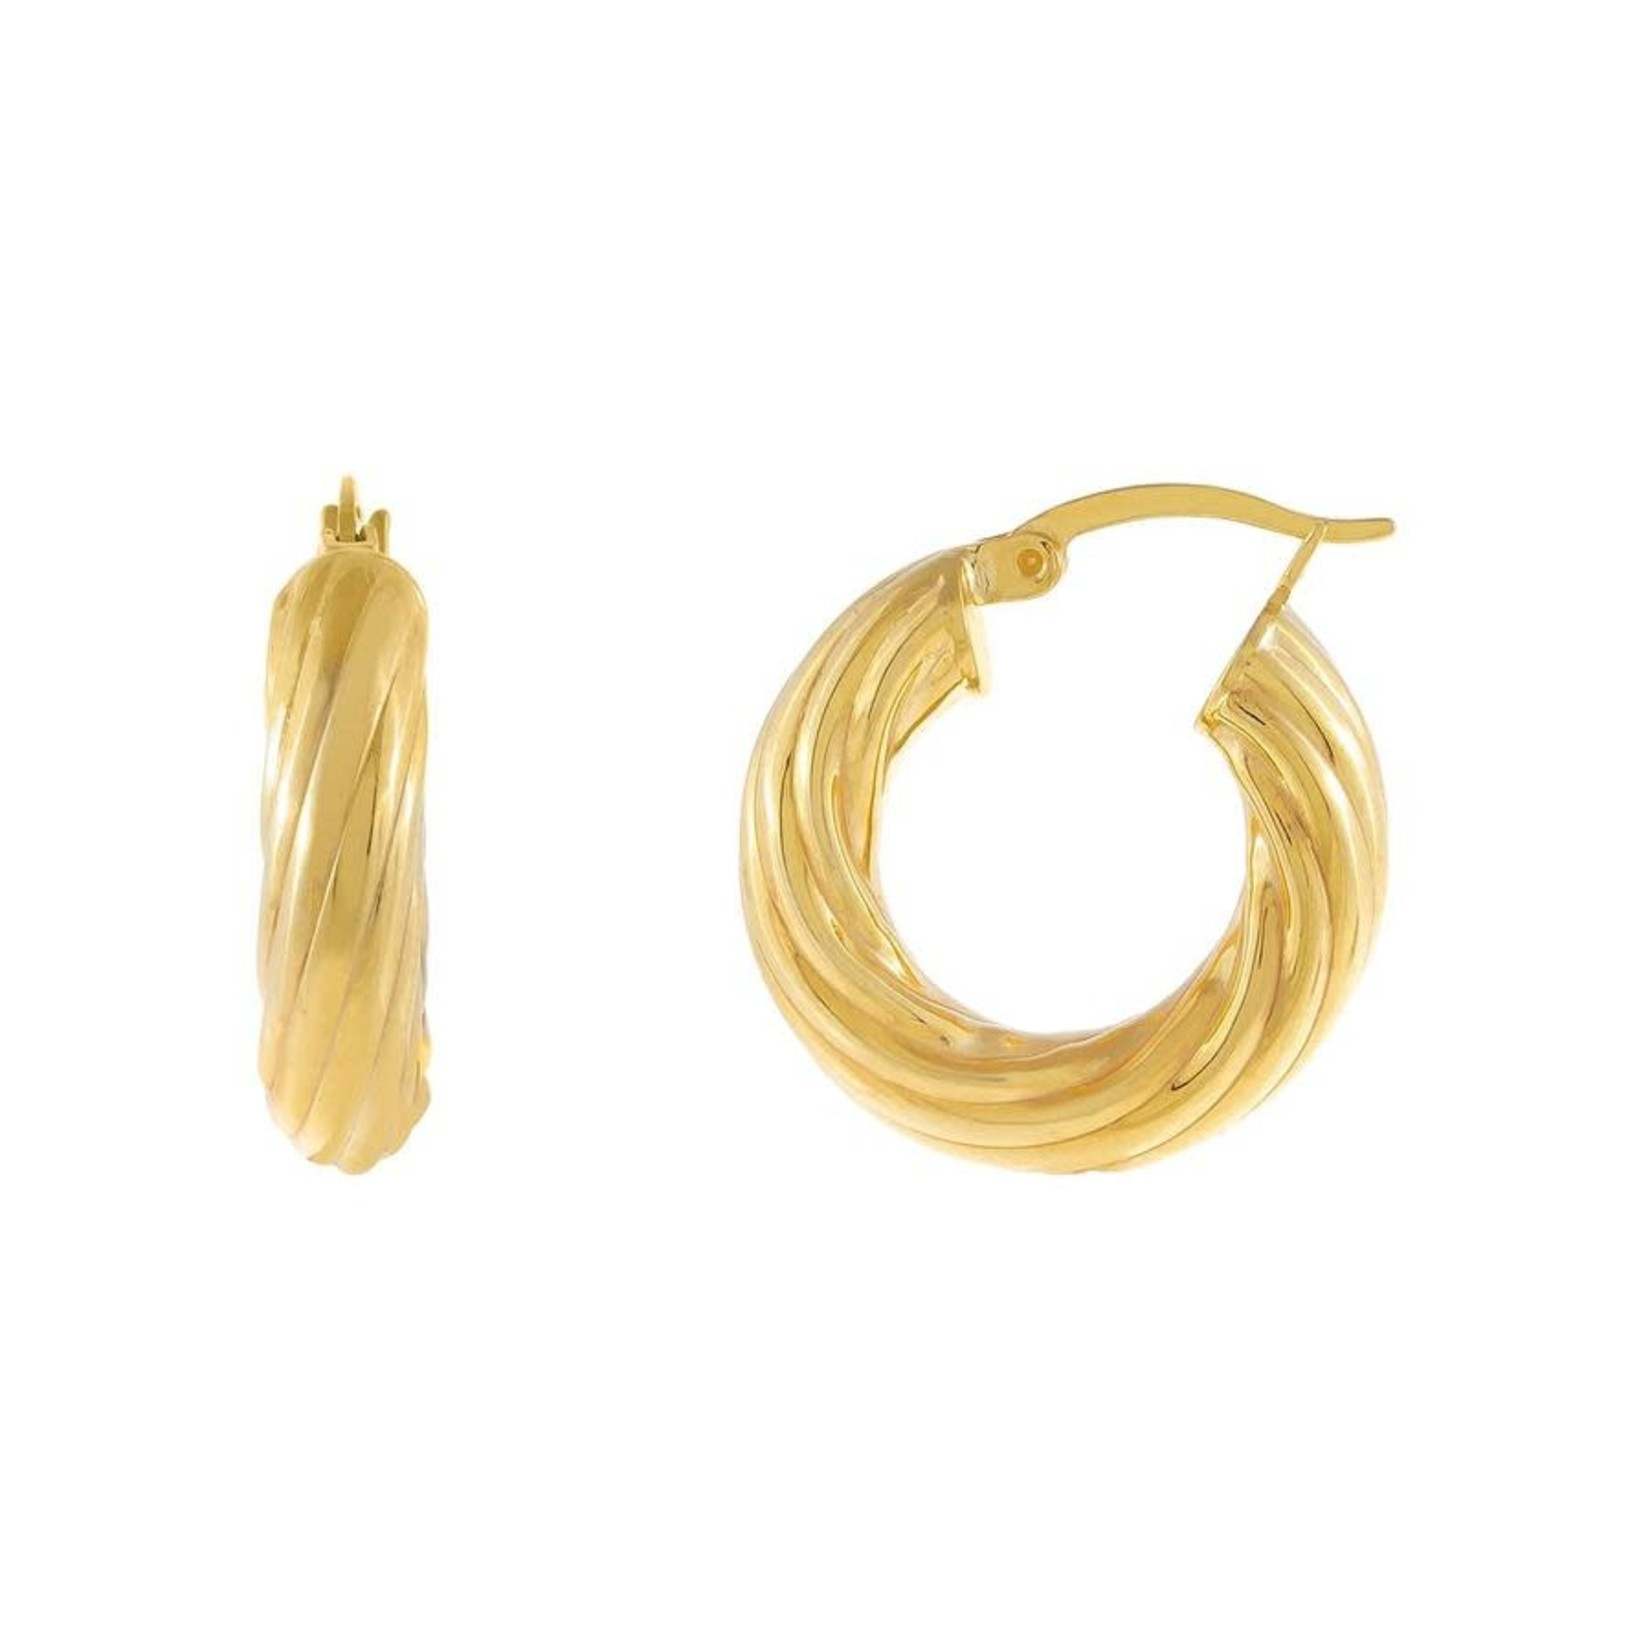 Adinas Chunky Hollow Twisted Hoop Earrings